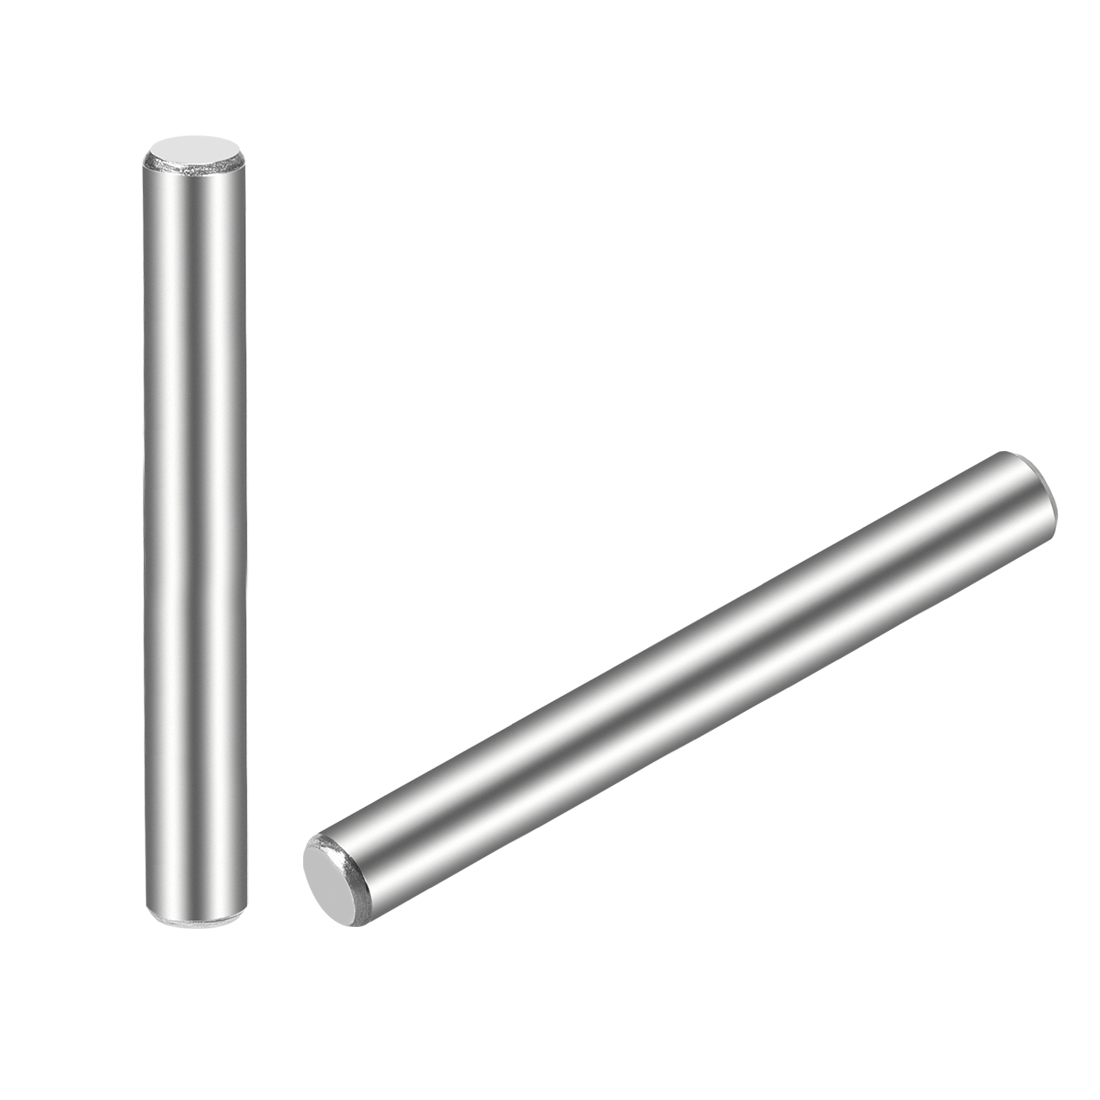 20Pcs 5mm x 60mm Dowel Pin 304 Stainless Steel Shelf Support Pin Fasten